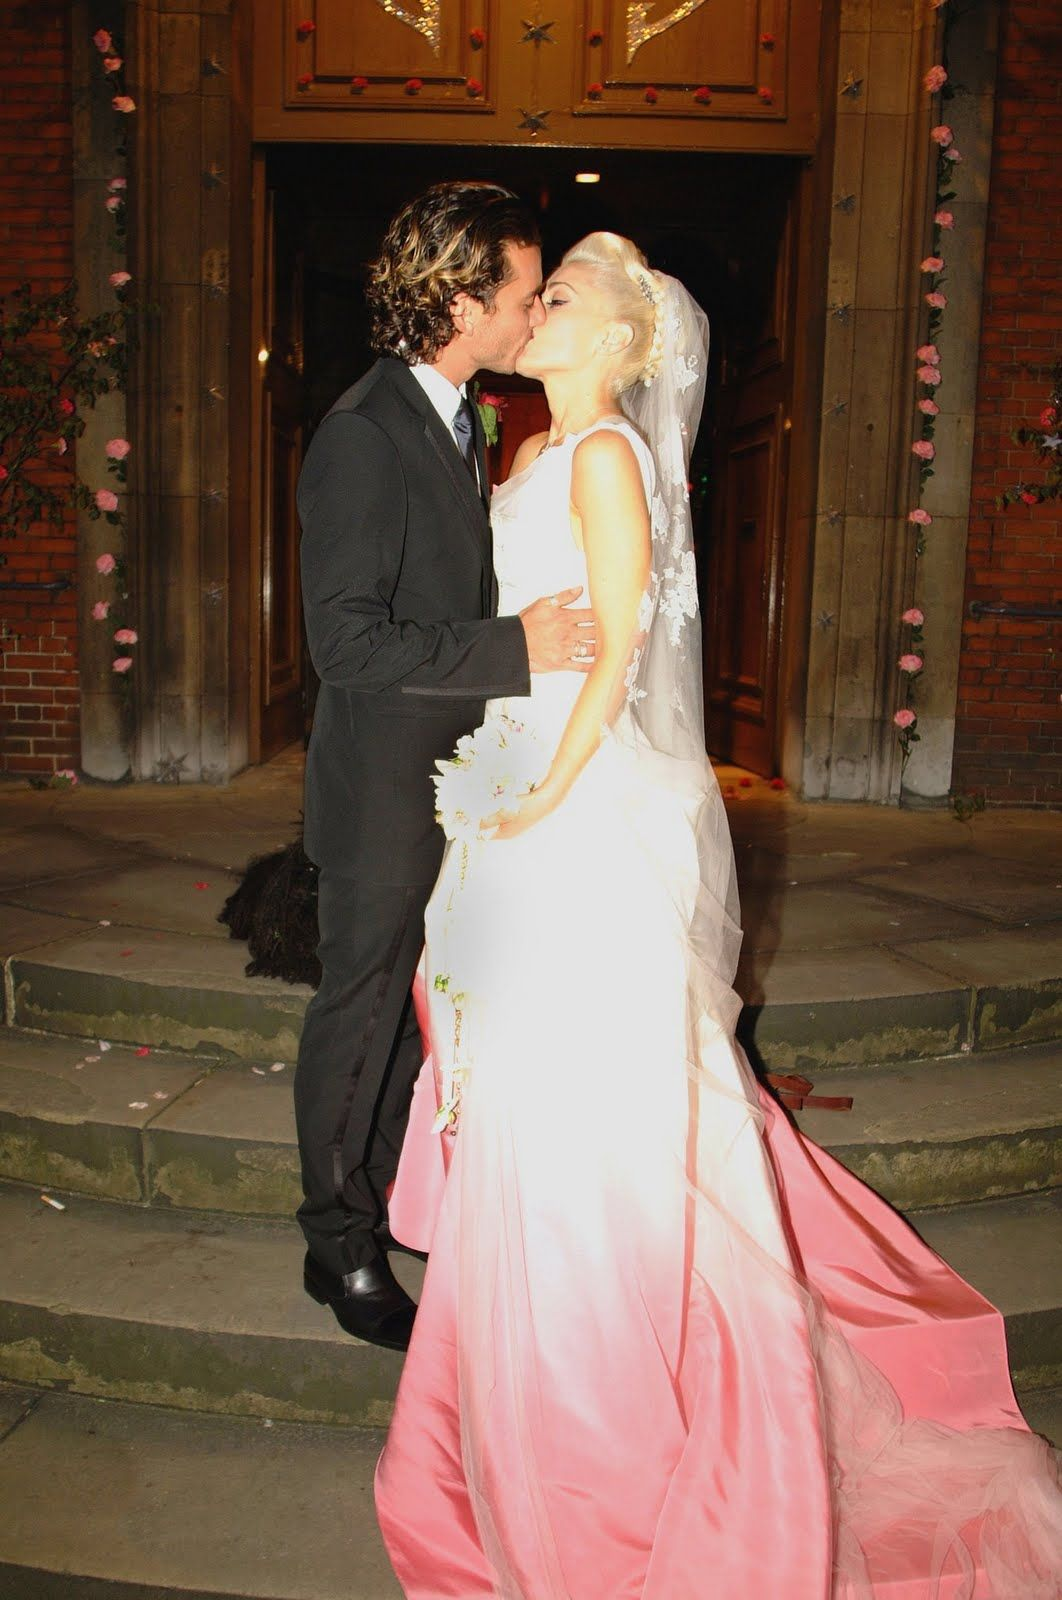 Gwen Stefani's pink and white wedding dress!